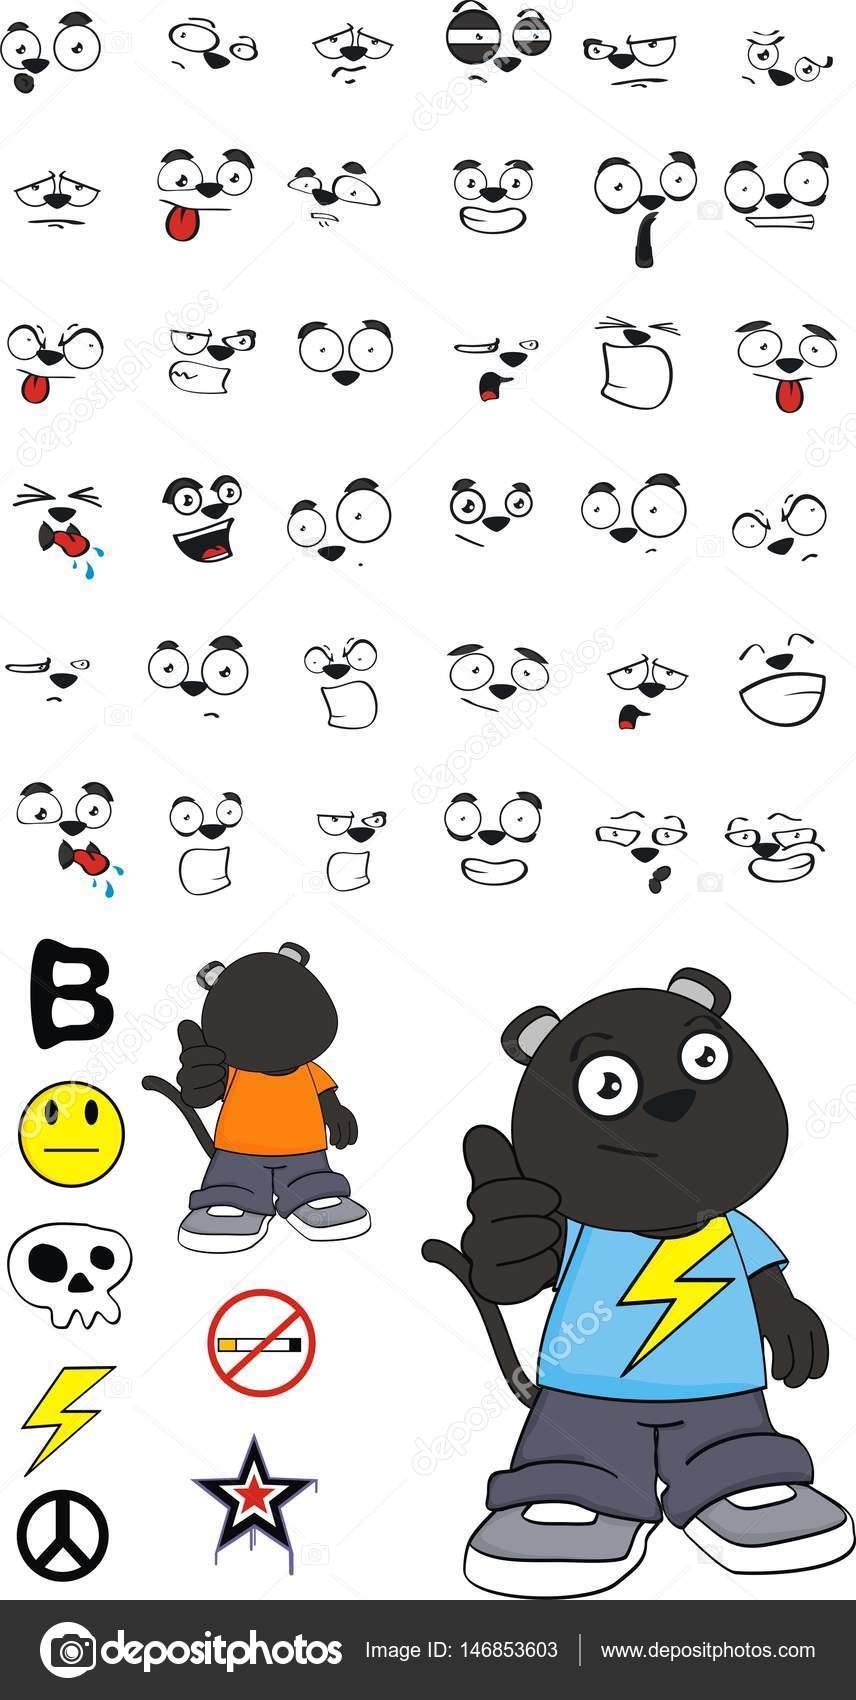 Dessin anime 5 emotions